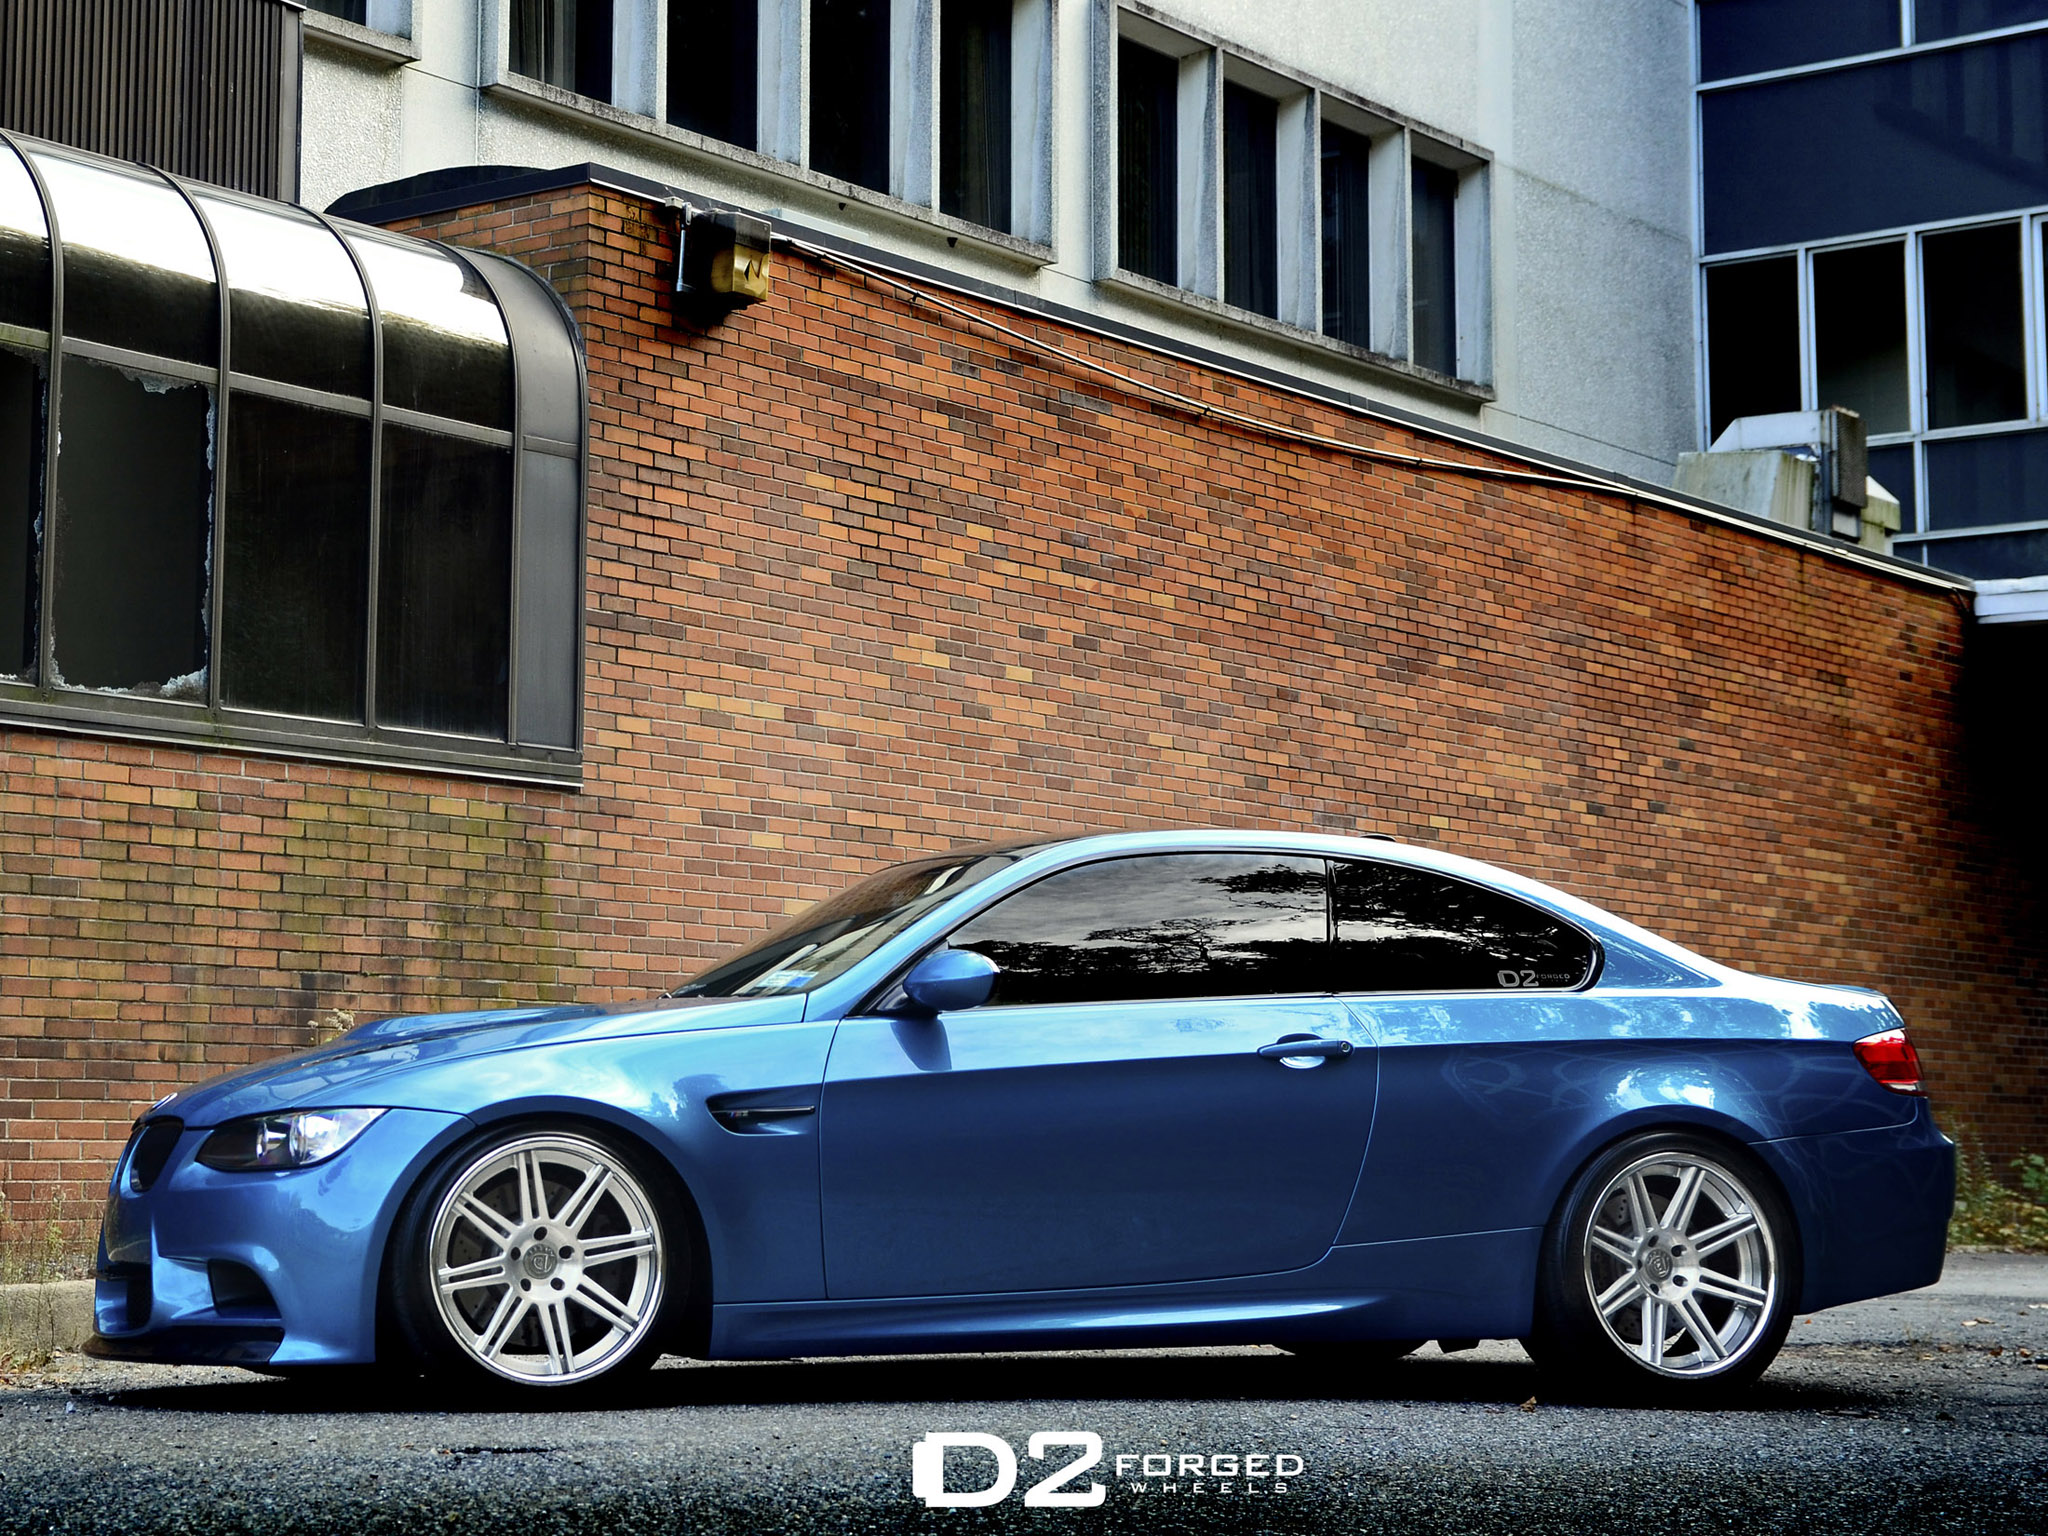 2013_D2Forged_BMW_M3_CV13_tuning_m_3__s_2048x1536.jpg